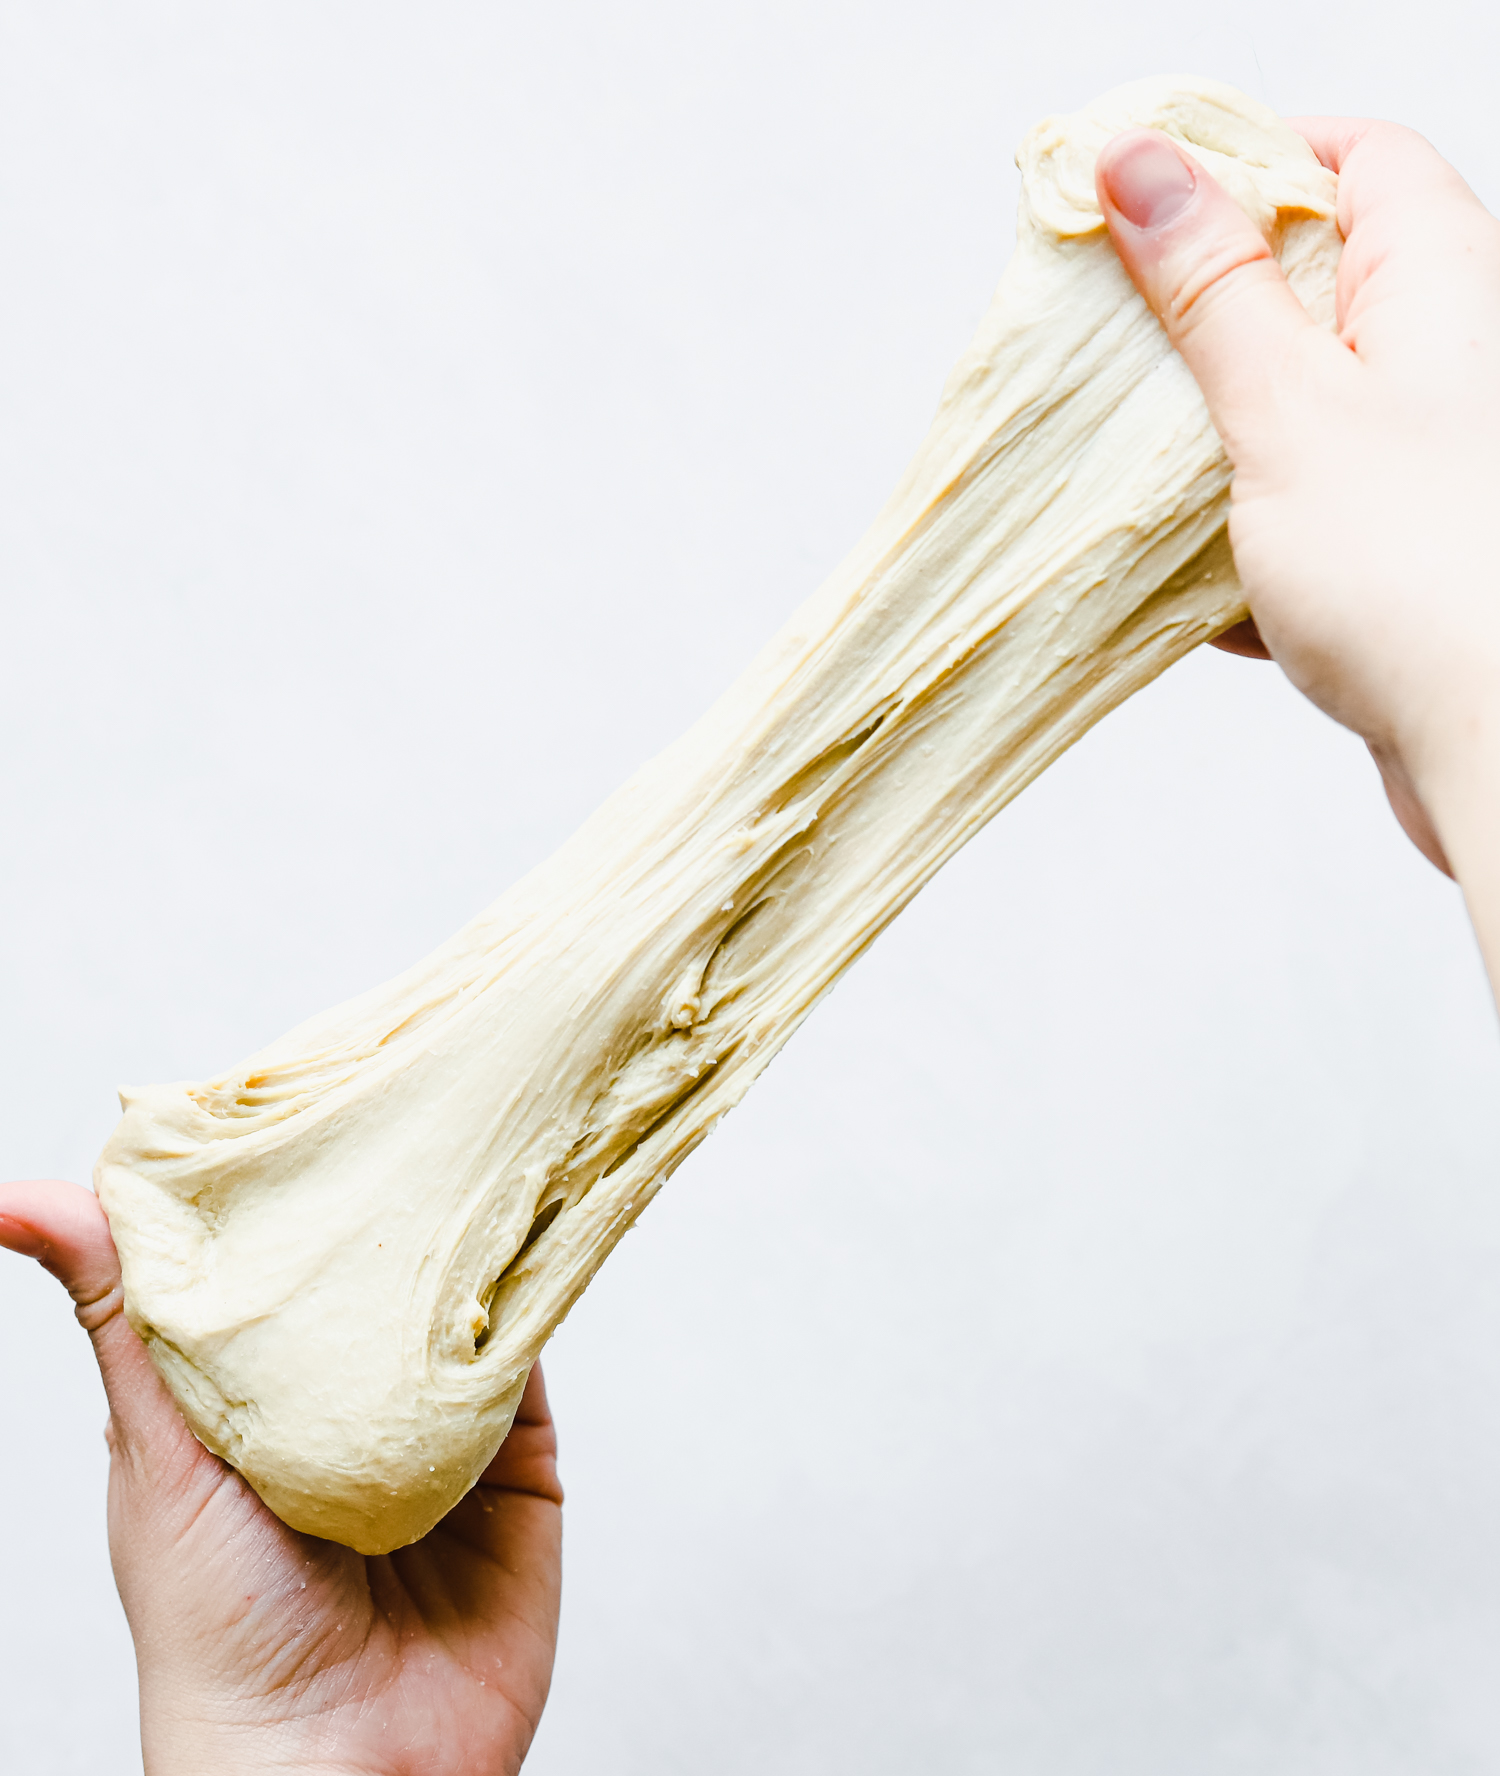 Stretching kneaded seitan dough, showing gluten formation.